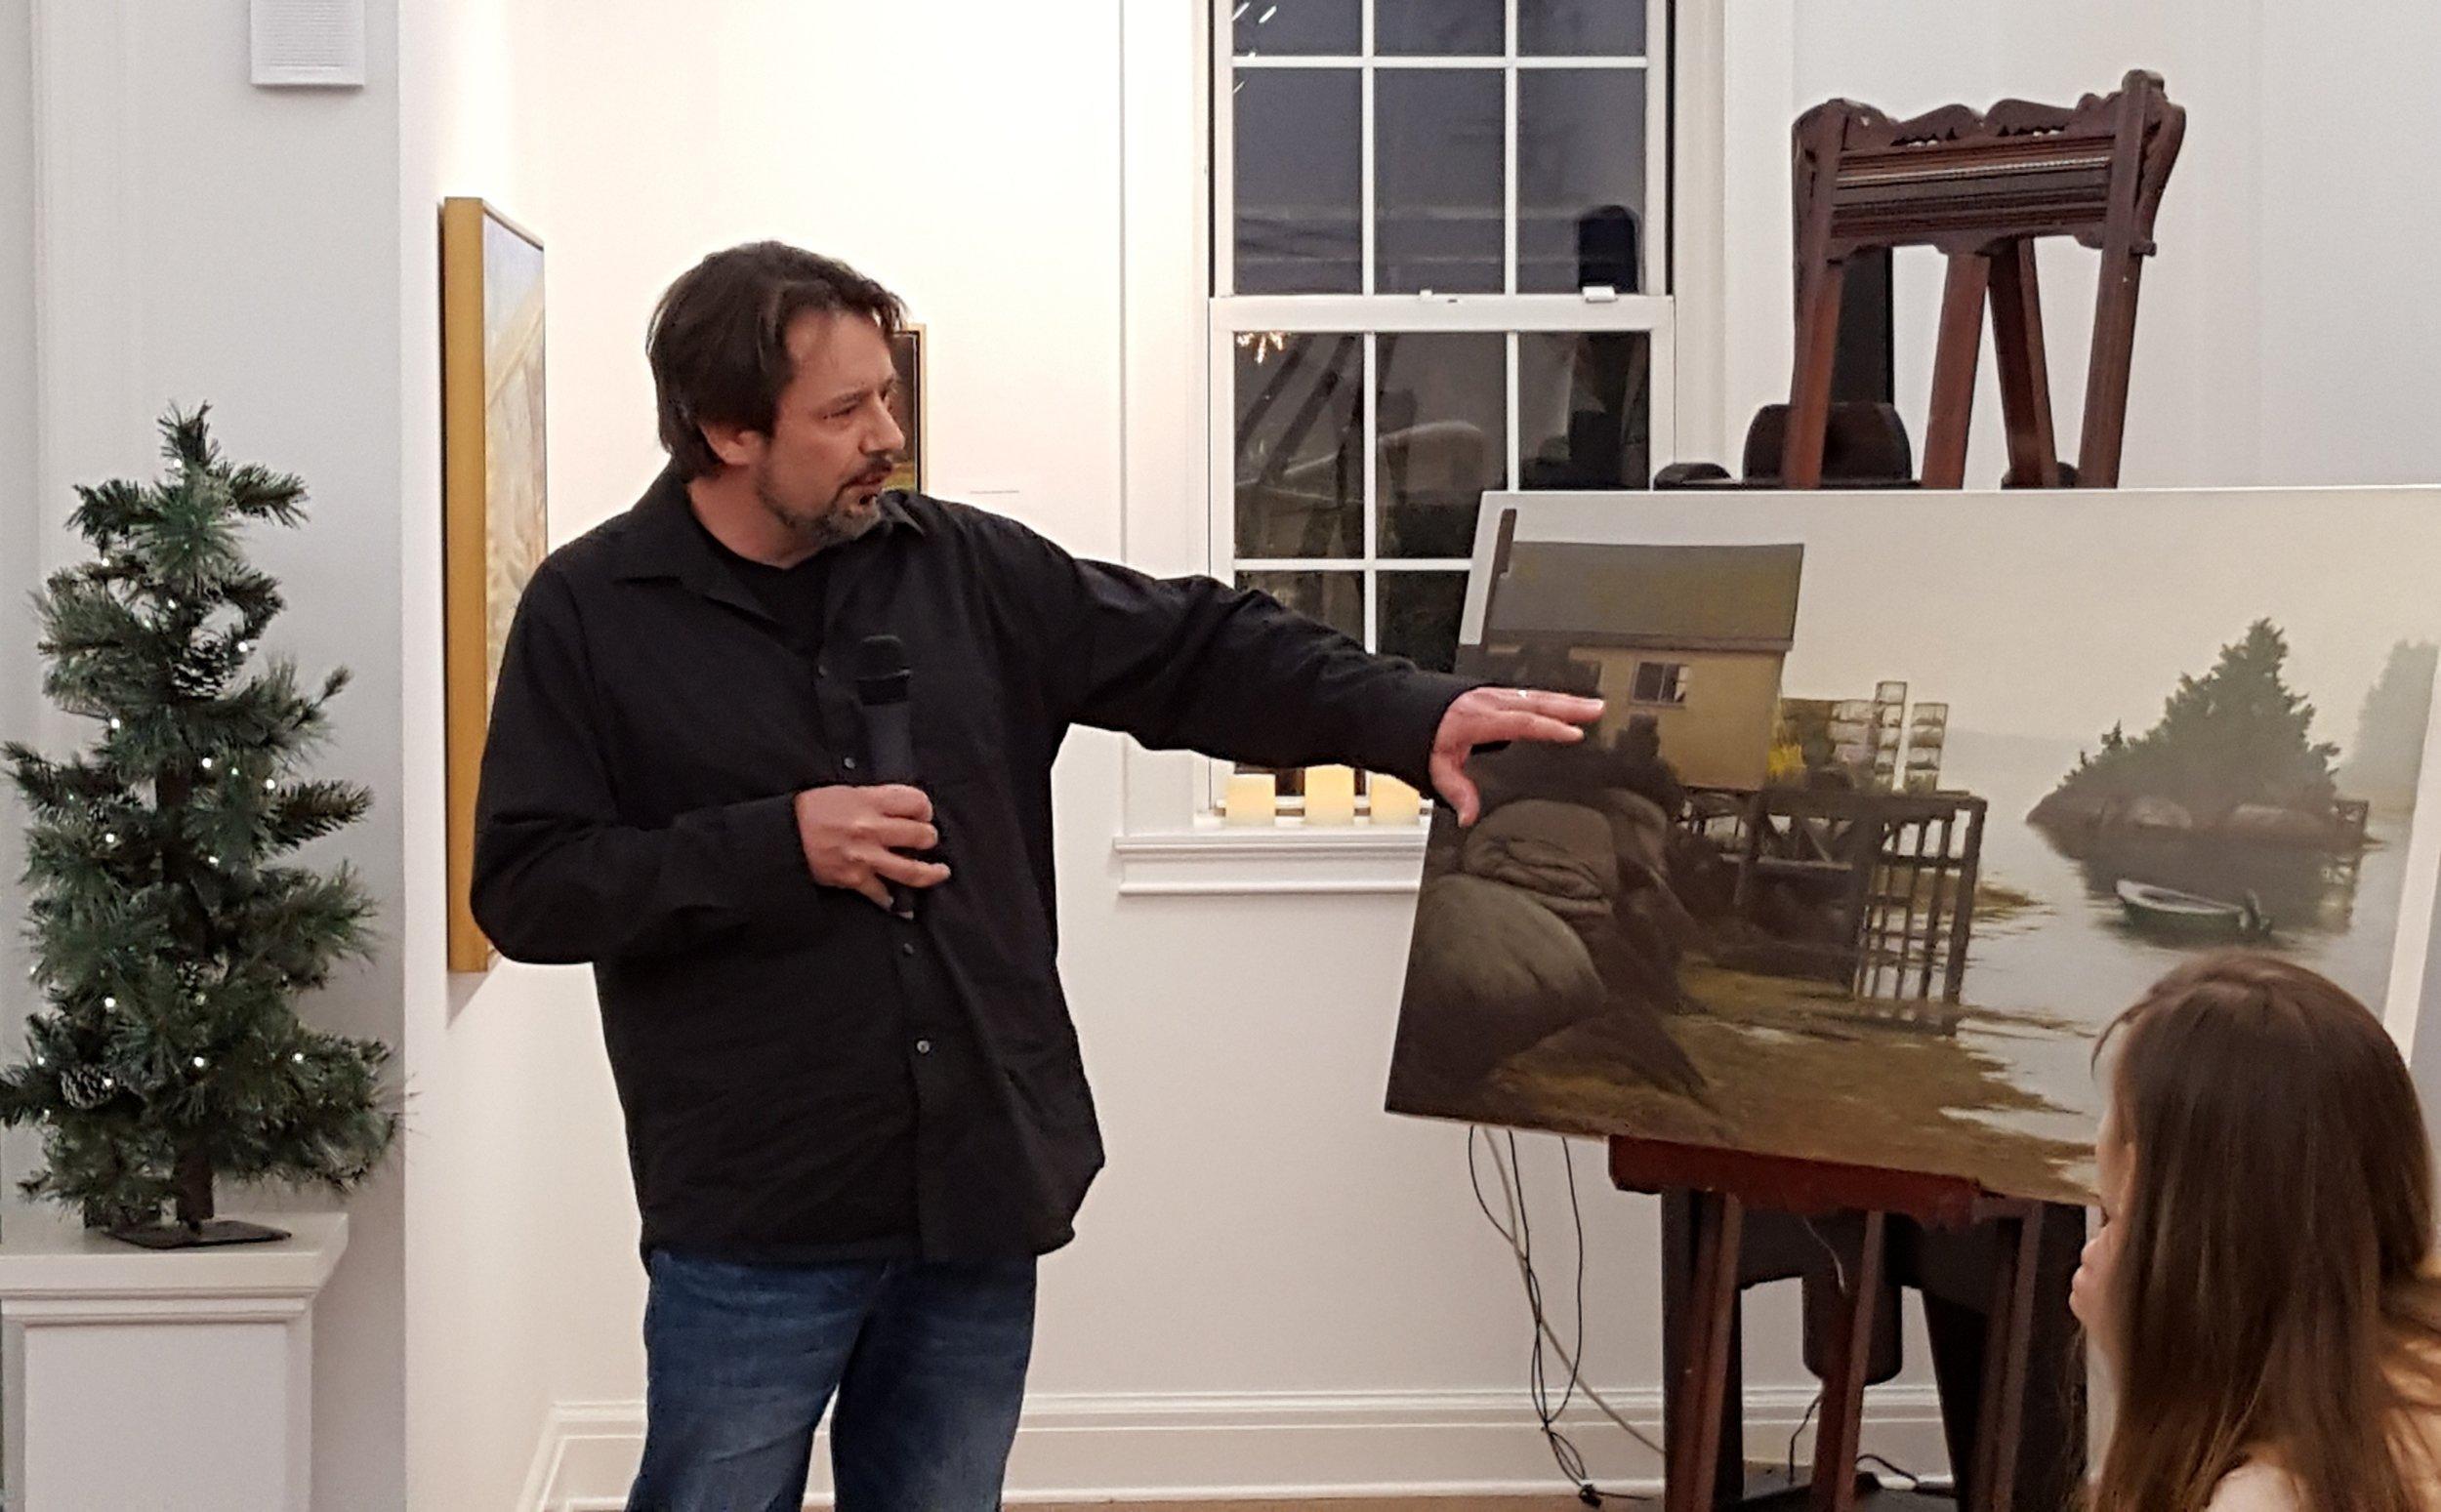 Artist Jim Molloy